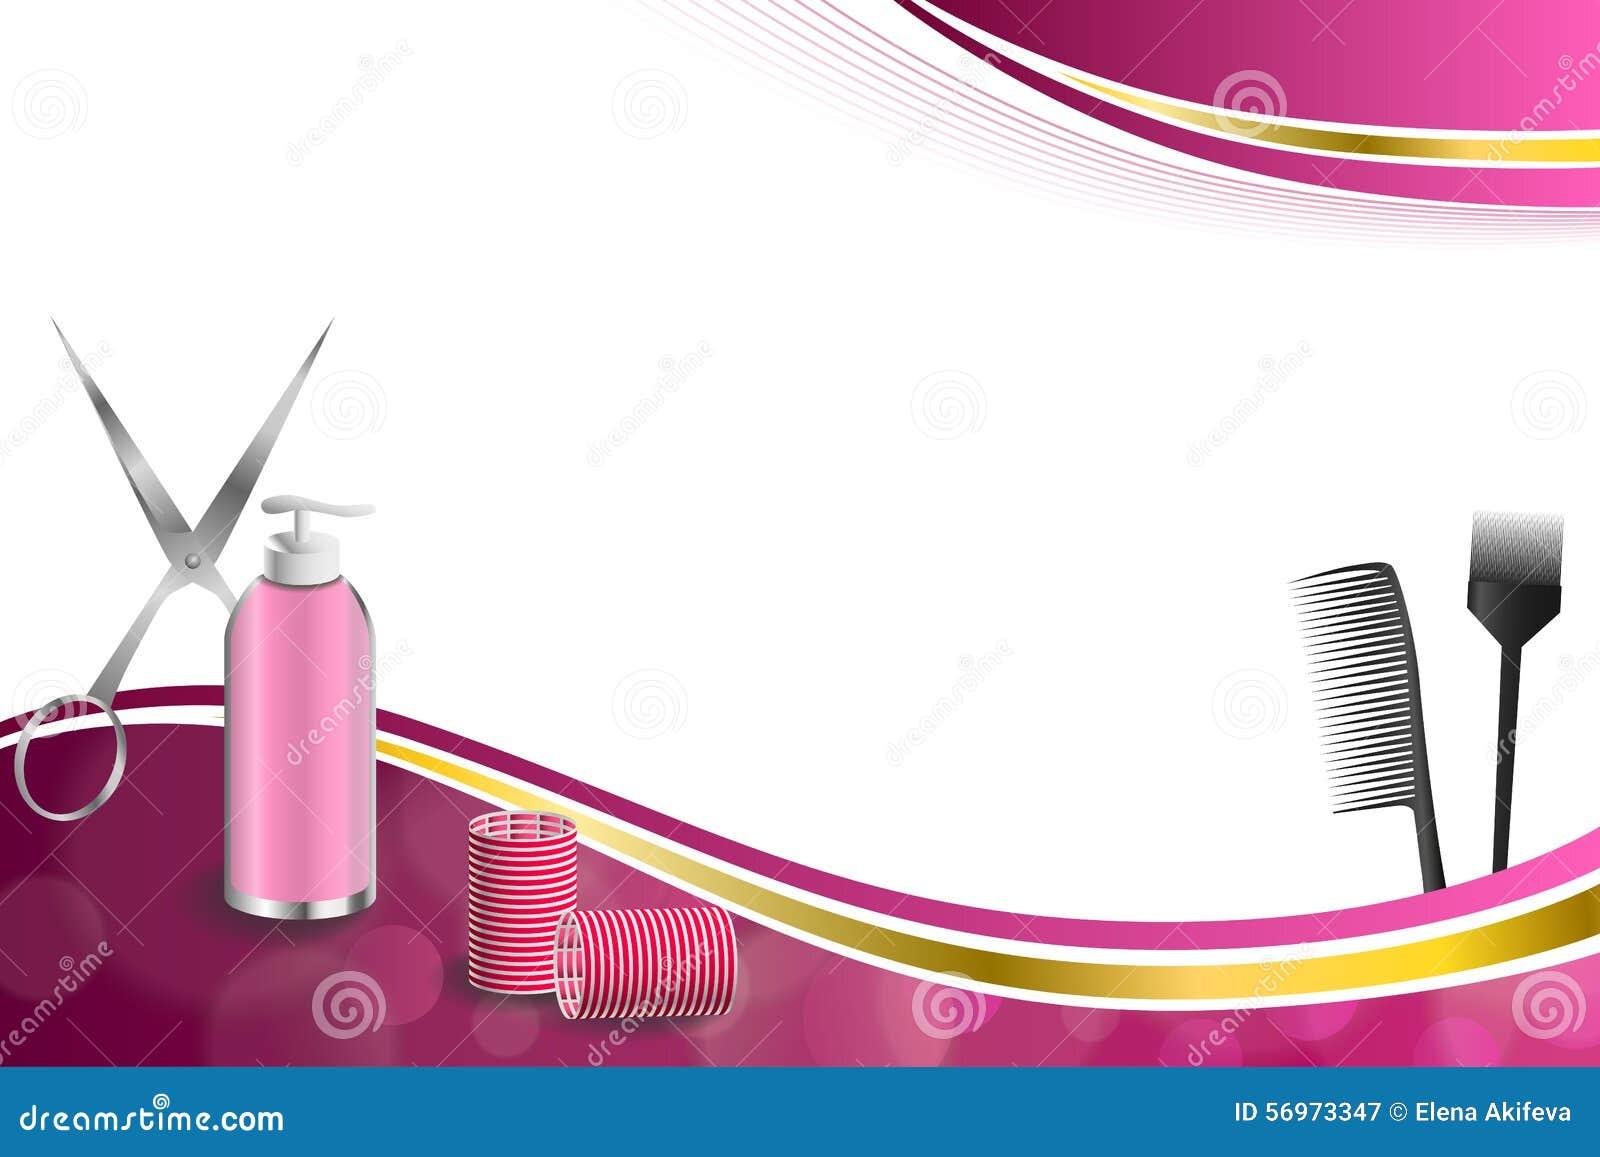 Hairdressing υποβάθρου αφηρημένη ρόδινη κουρέων εργαλείων κόκκινη ρόλερ ψαλιδιού απεικόνιση πλαισίων κορδελλών βουρτσών χρυσή